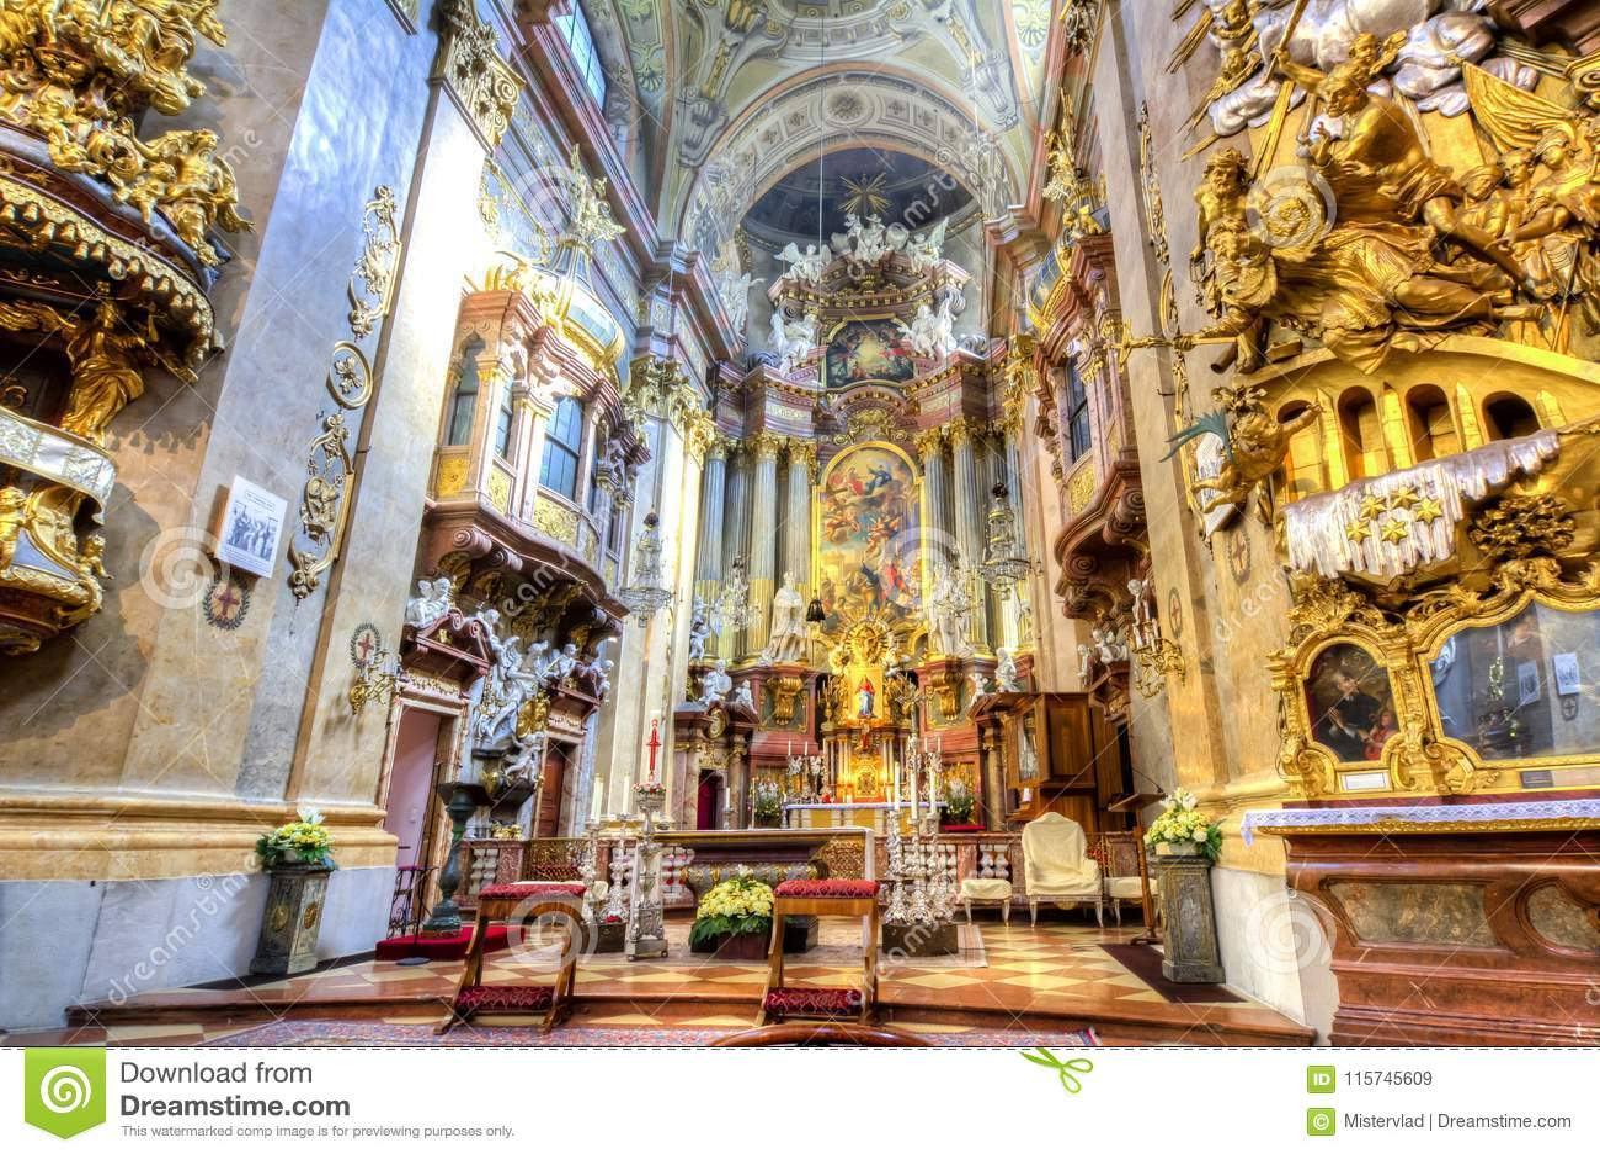 Interior Of St Peter Church Peterskirche In Vienna Austria Stock